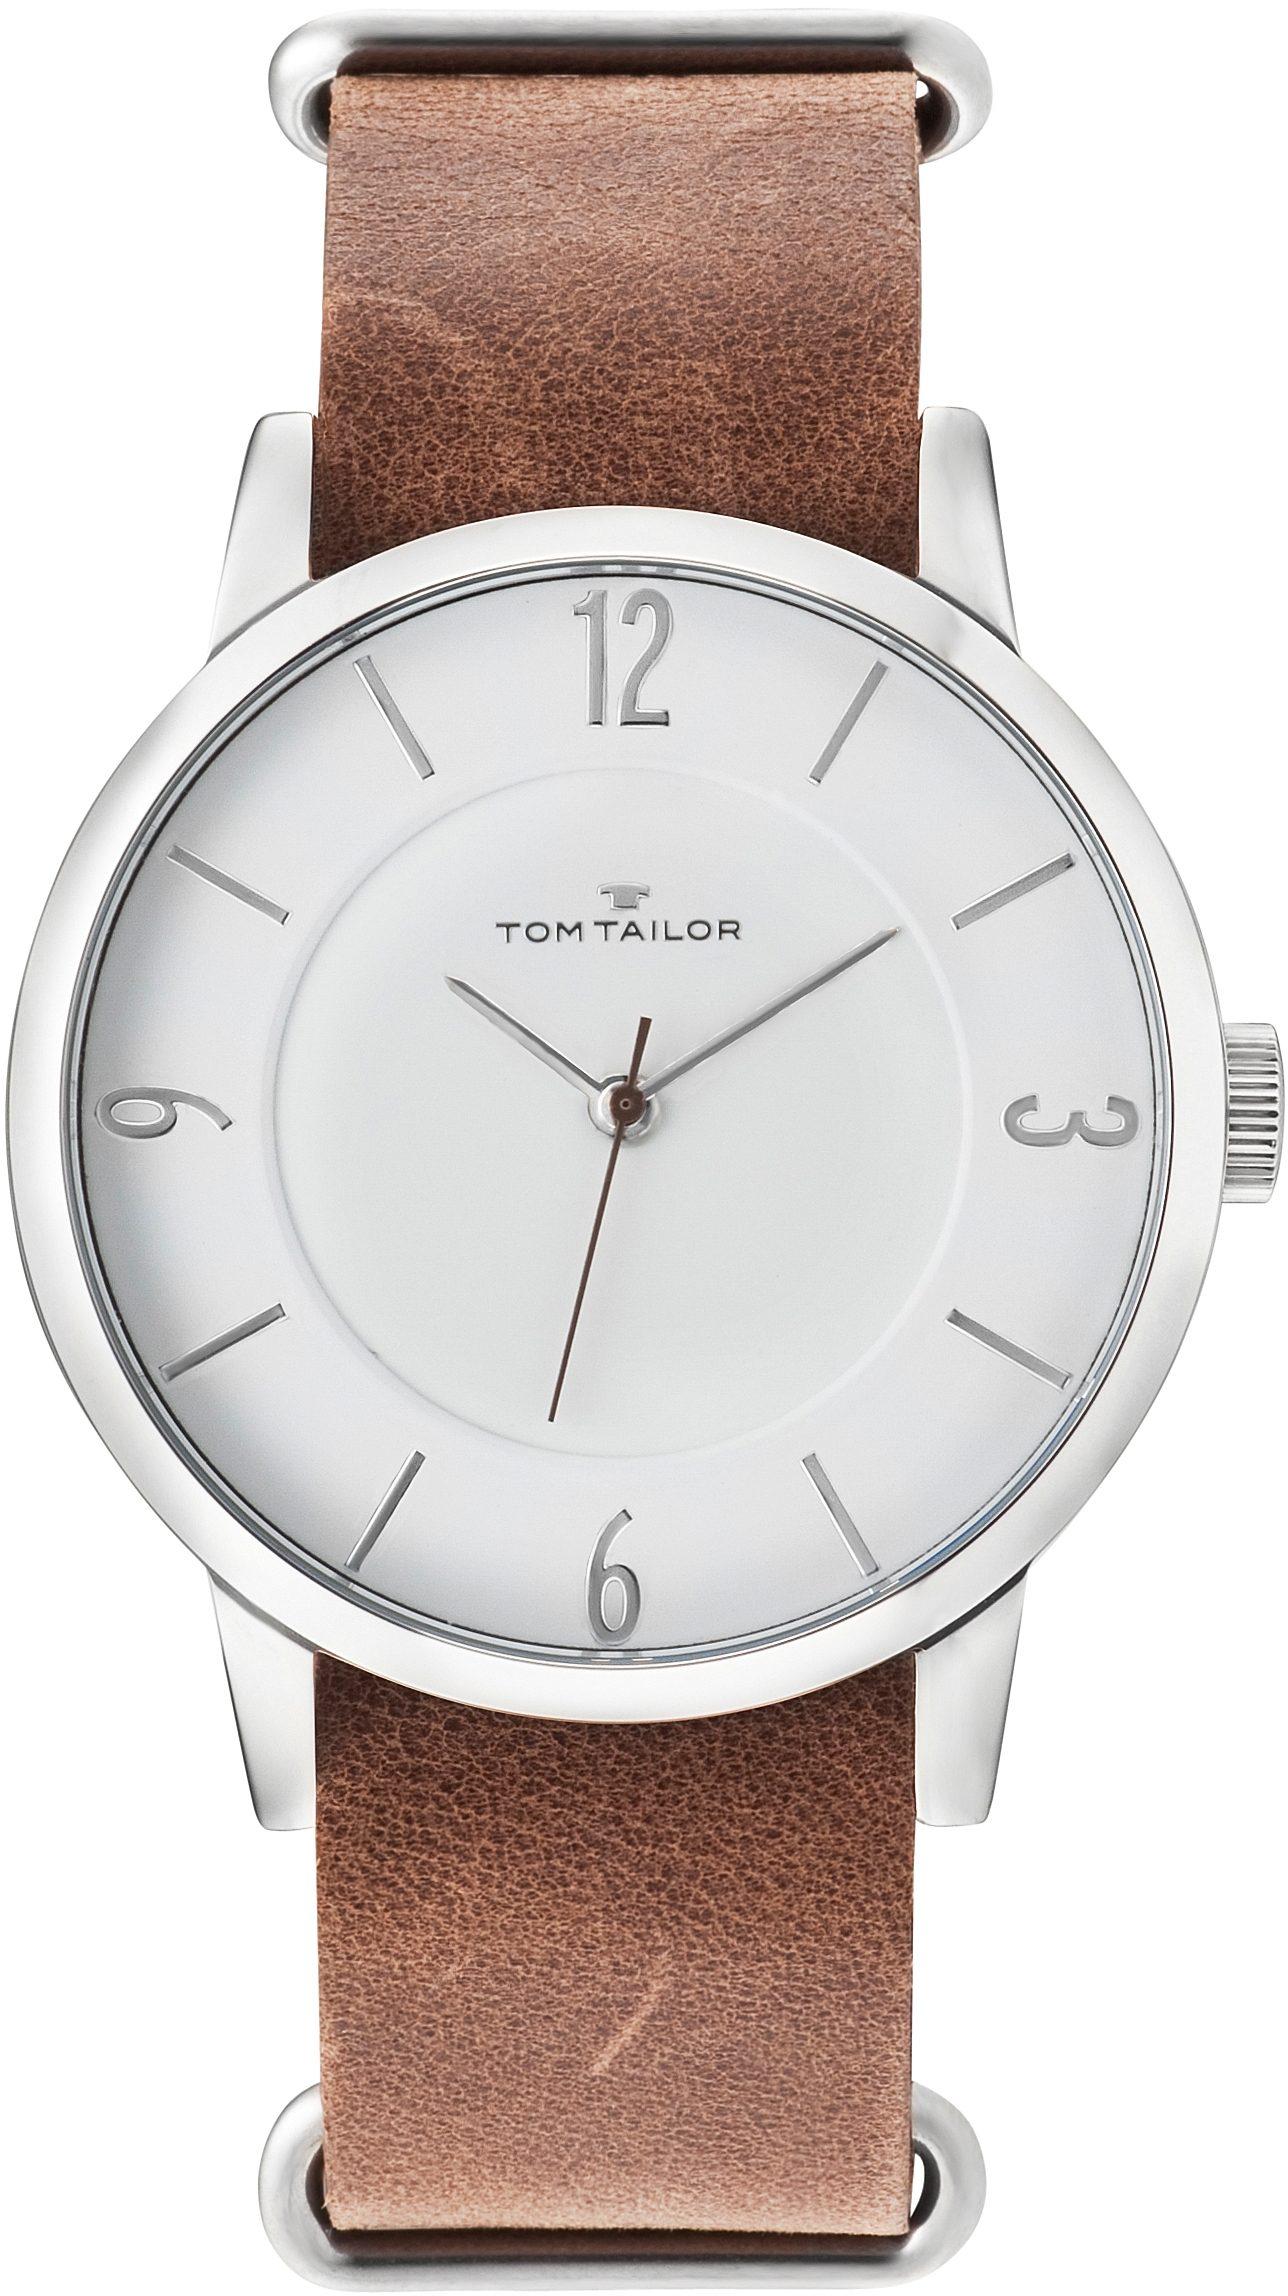 Tom Tailor Armbanduhr, »5416903«